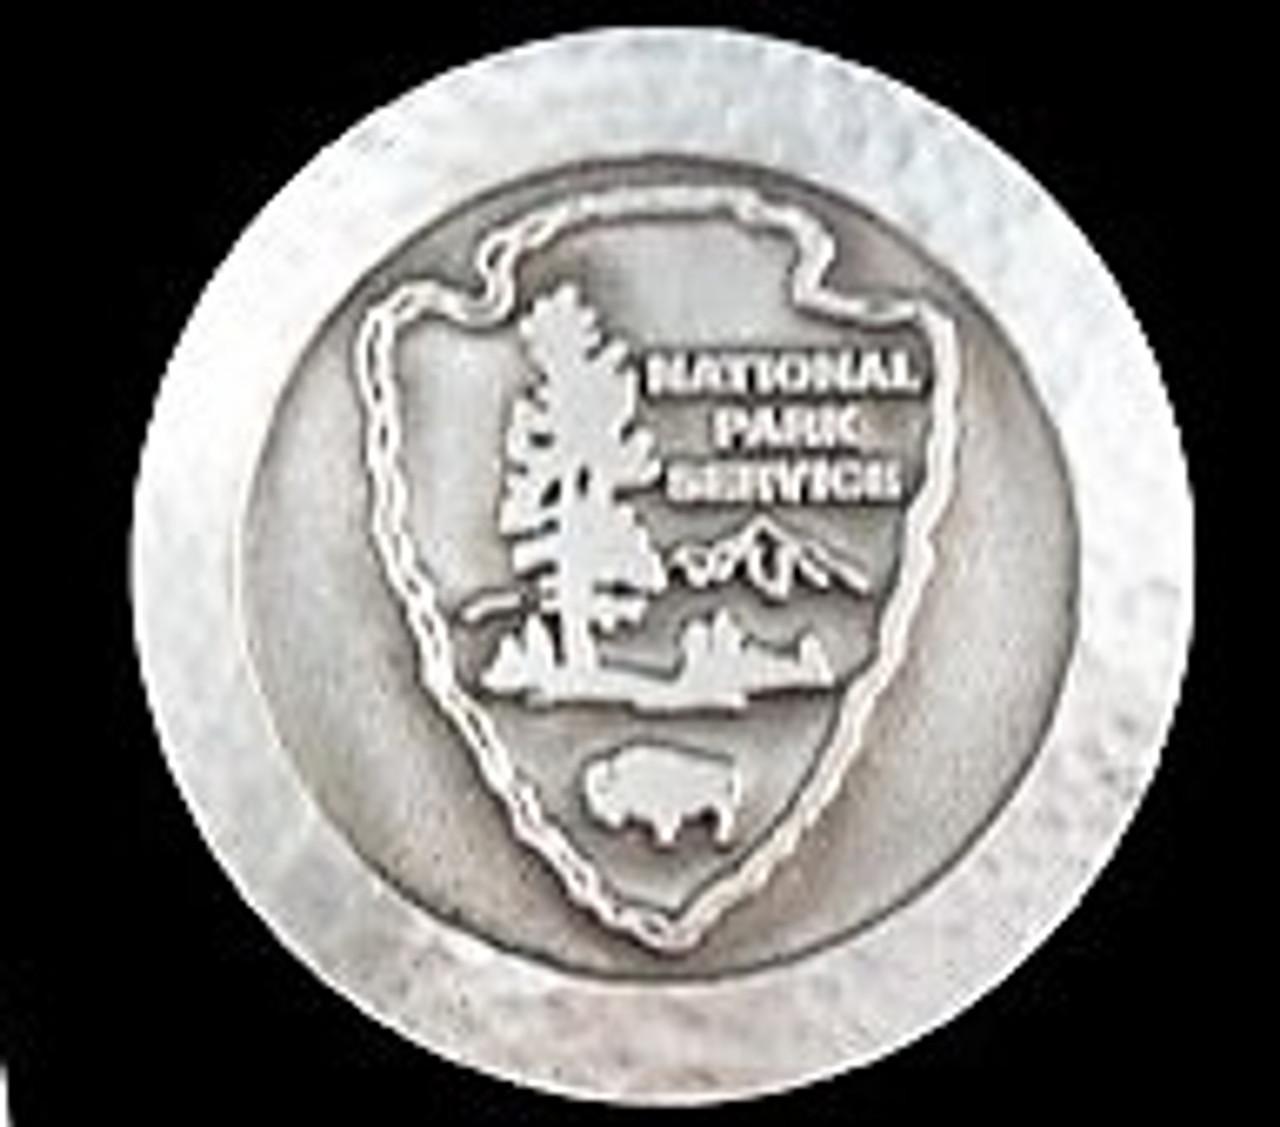 National Park Service Volunteer Appreciation Coin